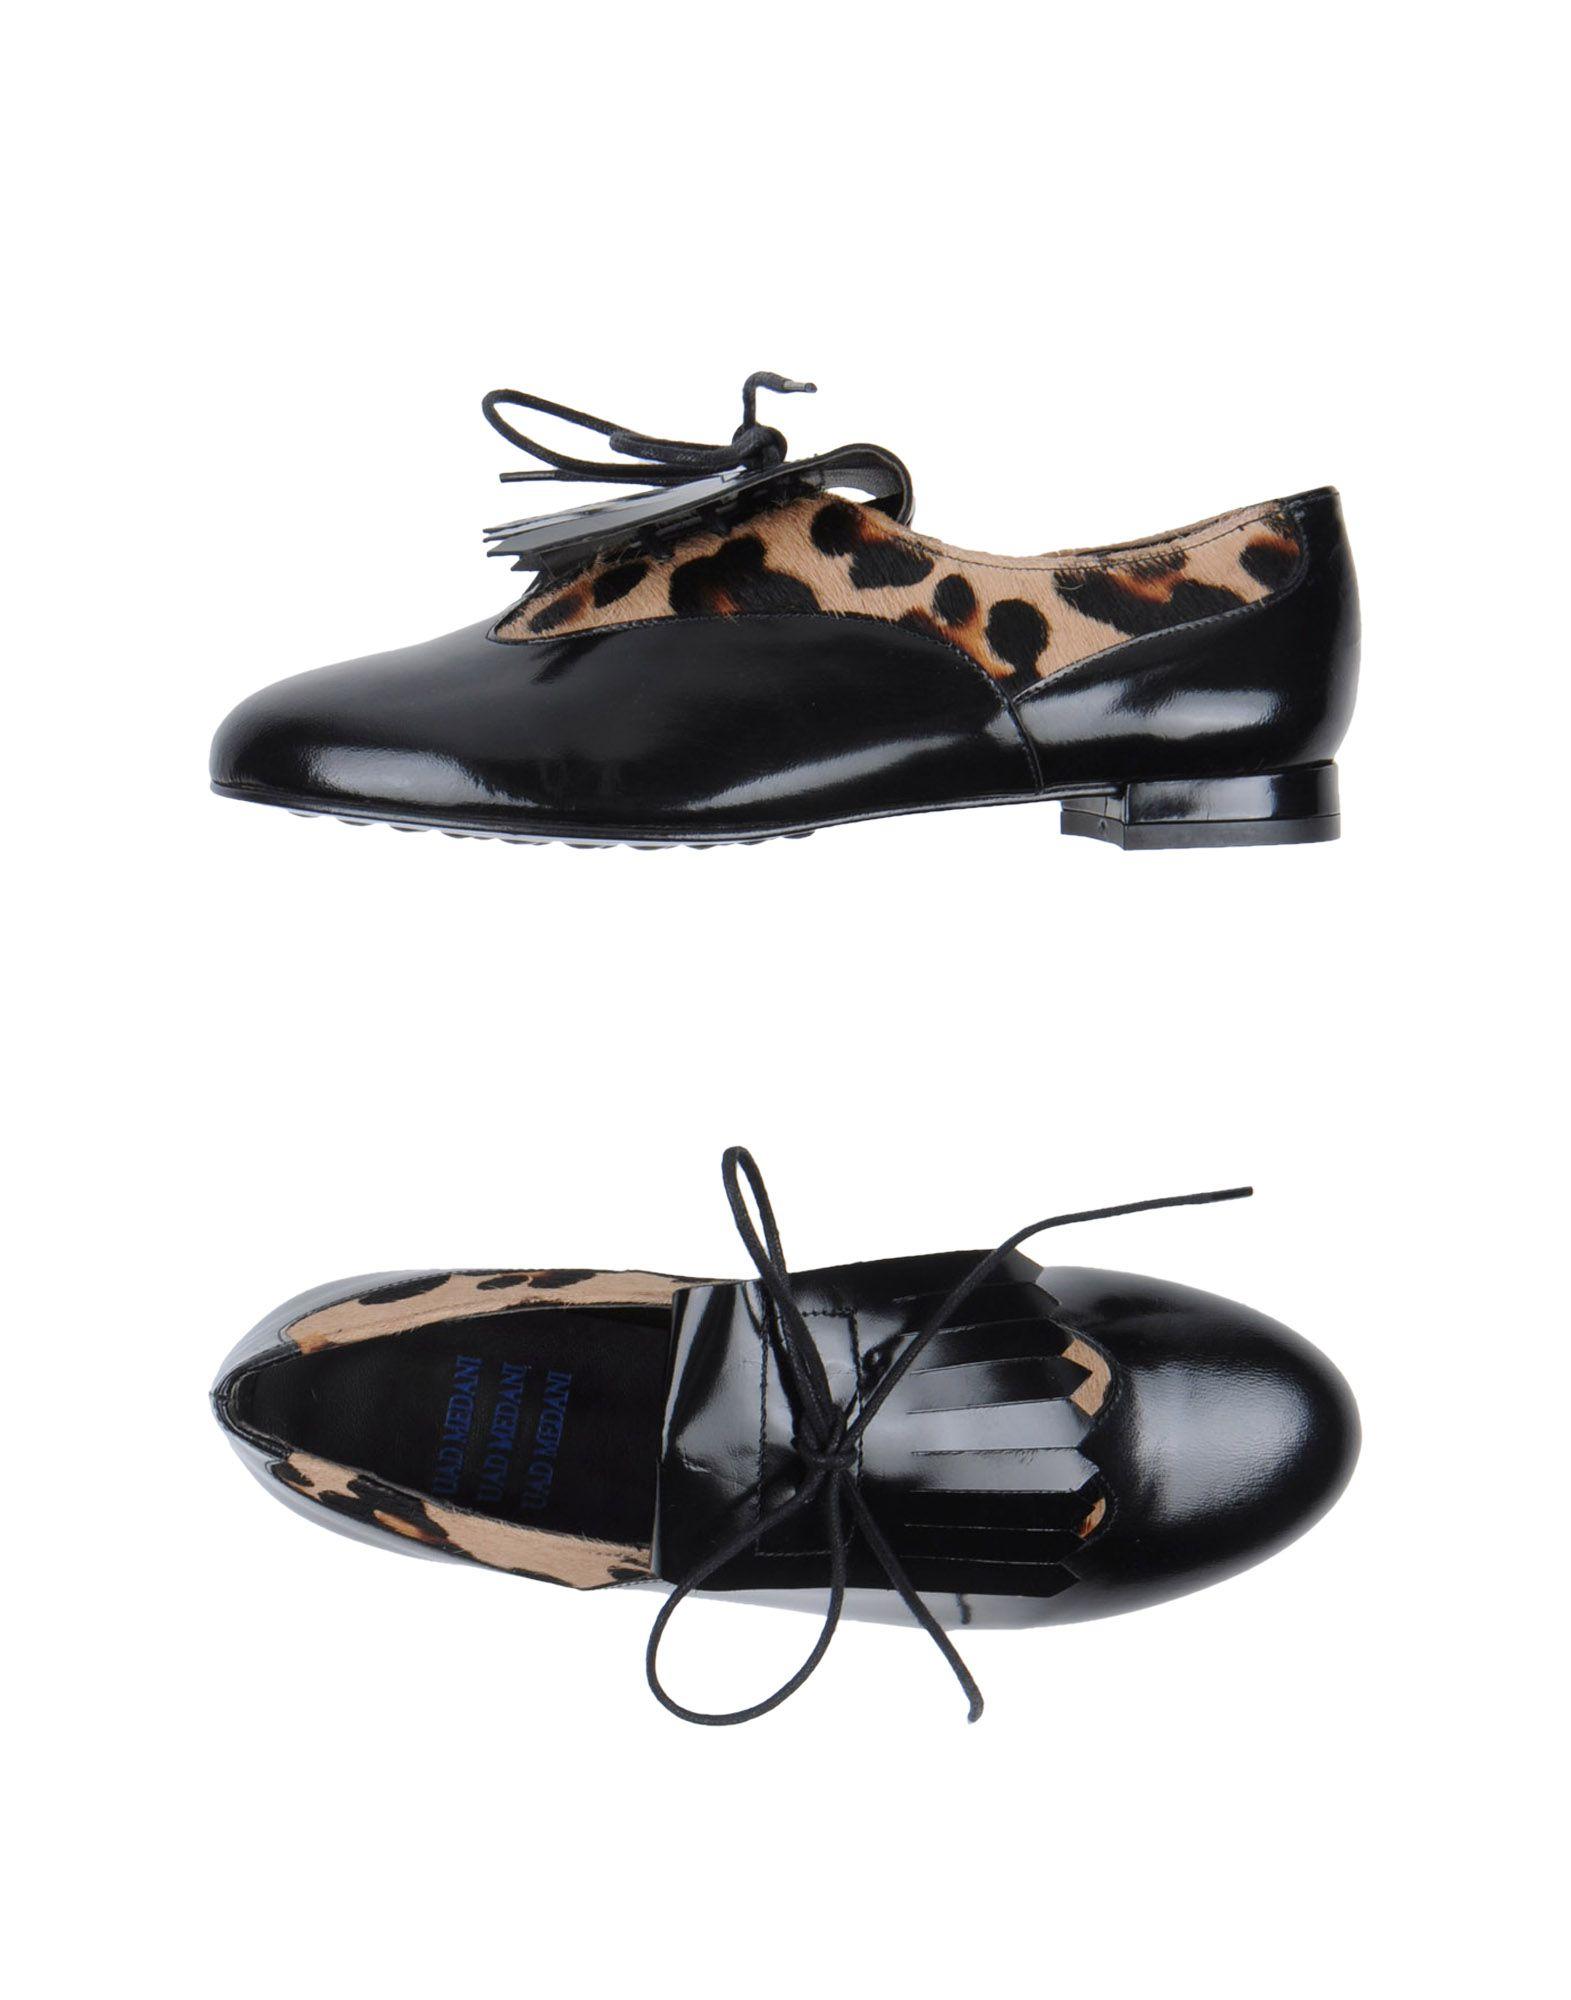 De 837704 Zapatos Foto Uad Cordones Medani Mujer Negro tqnOPxTf